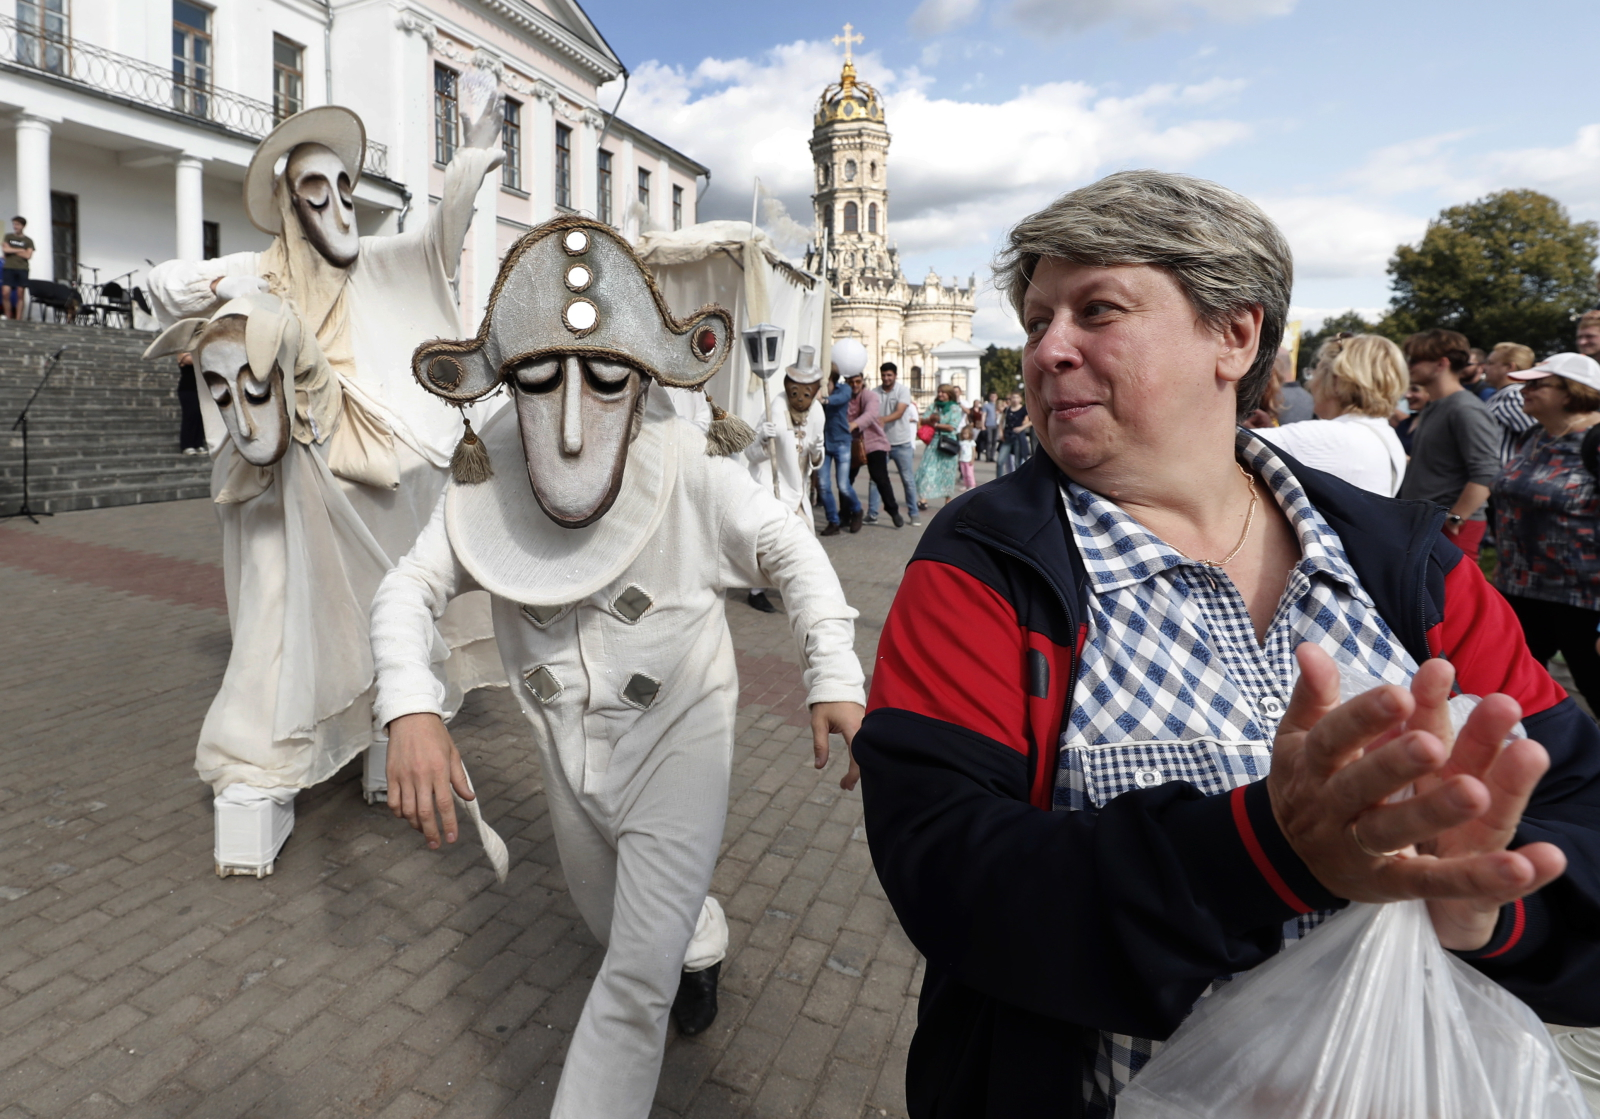 Festiwal Teatrów w Rosji  EPA/MAXIM SHIPENKOV